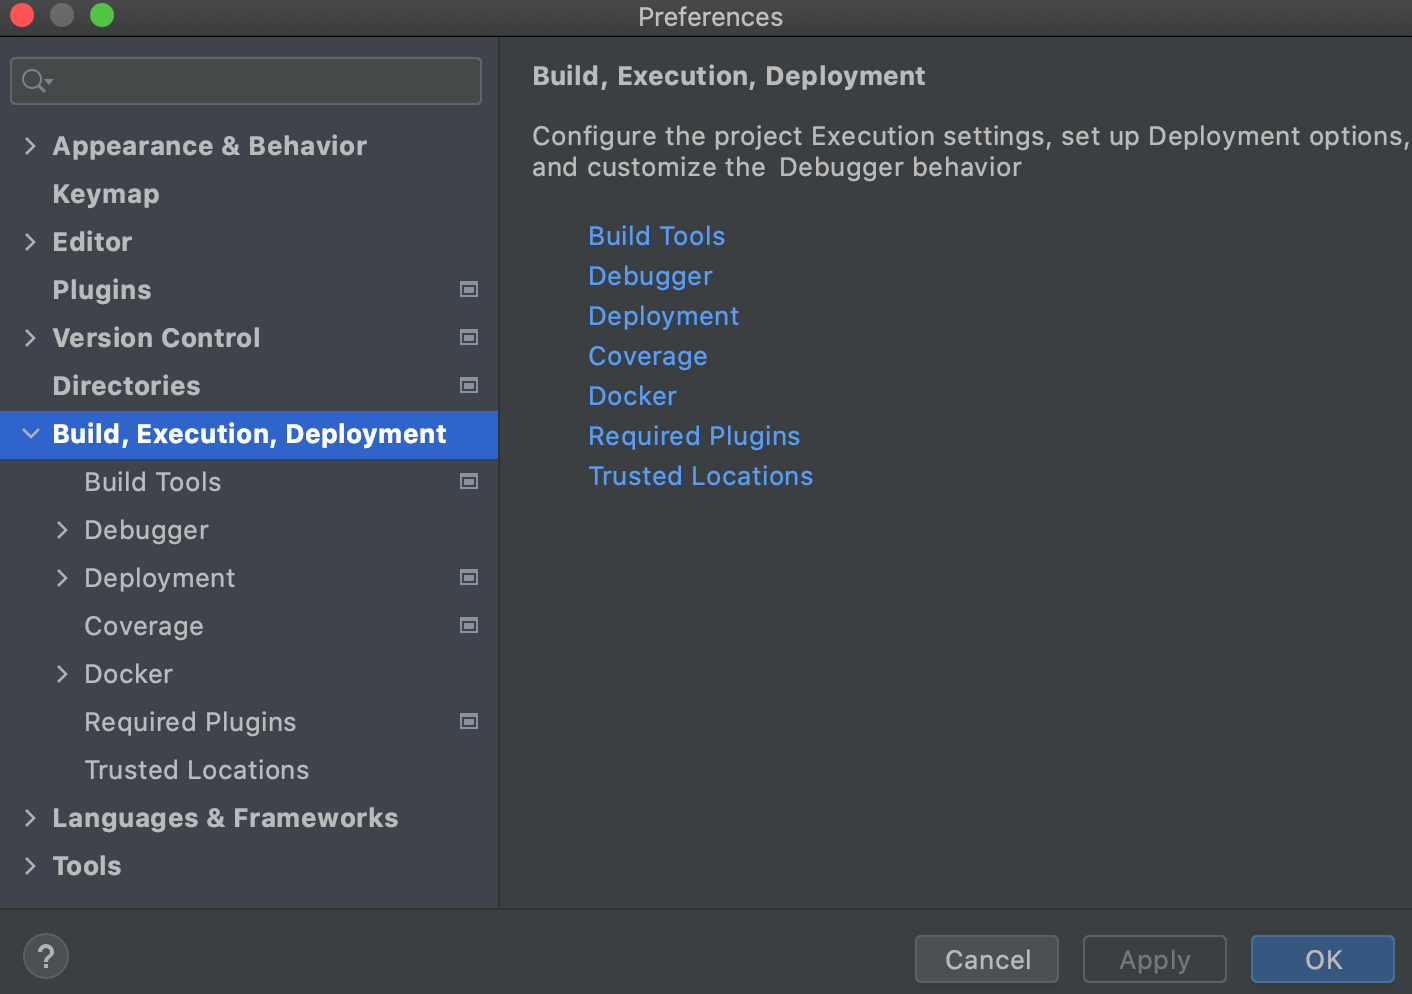 Build, Execution, Deployment